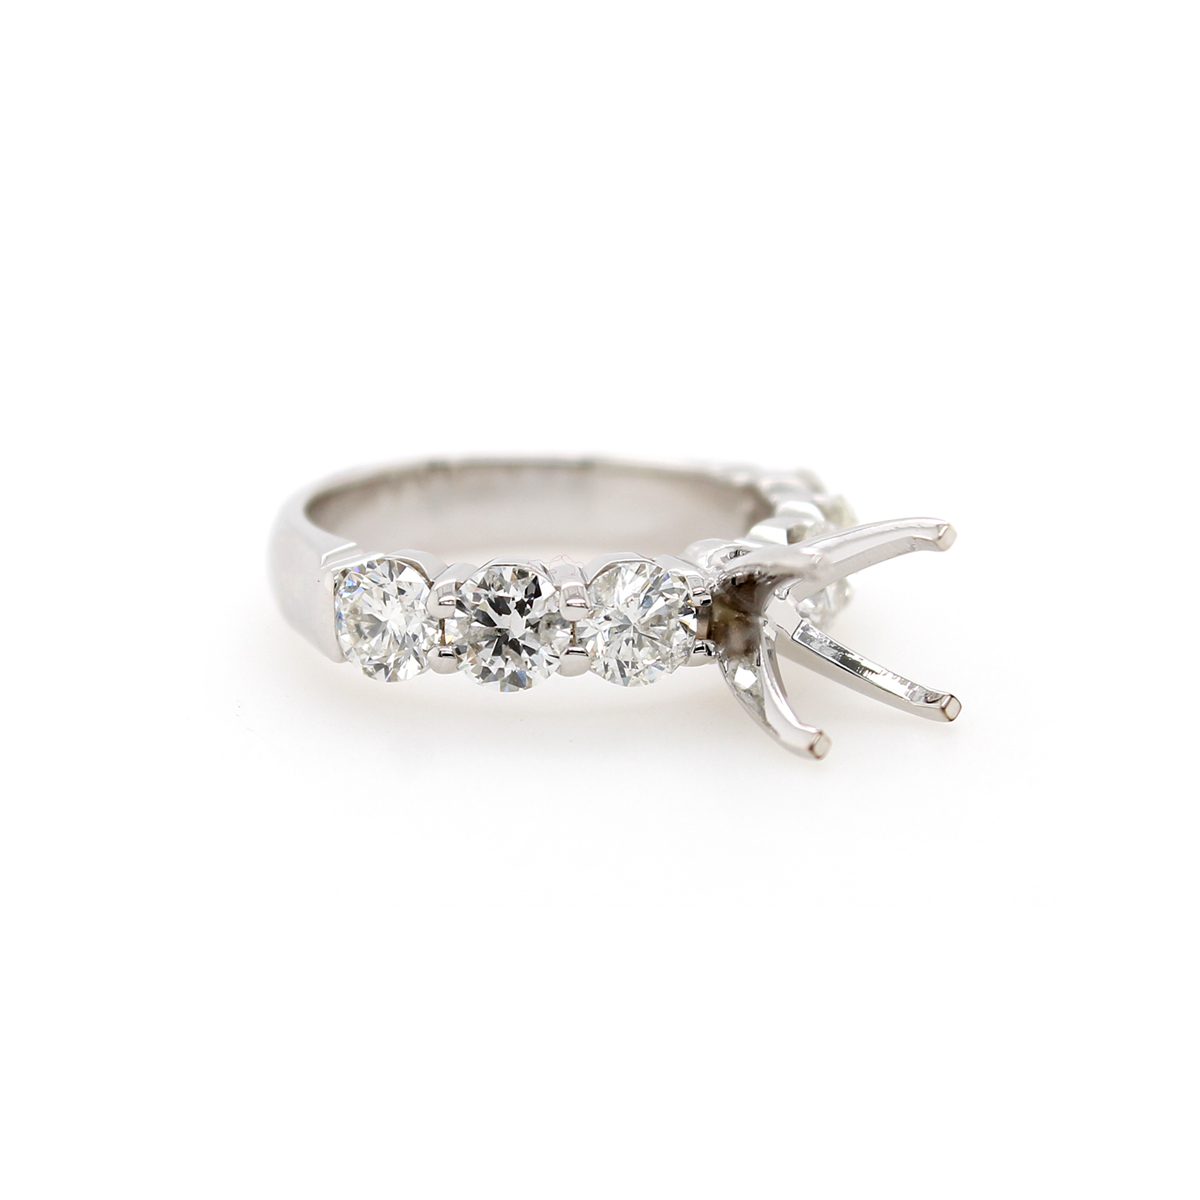 Shefi Diamonds 14 Karat White Gold 2 Carat Round Brilliant Semi-Mount Engagement Ring